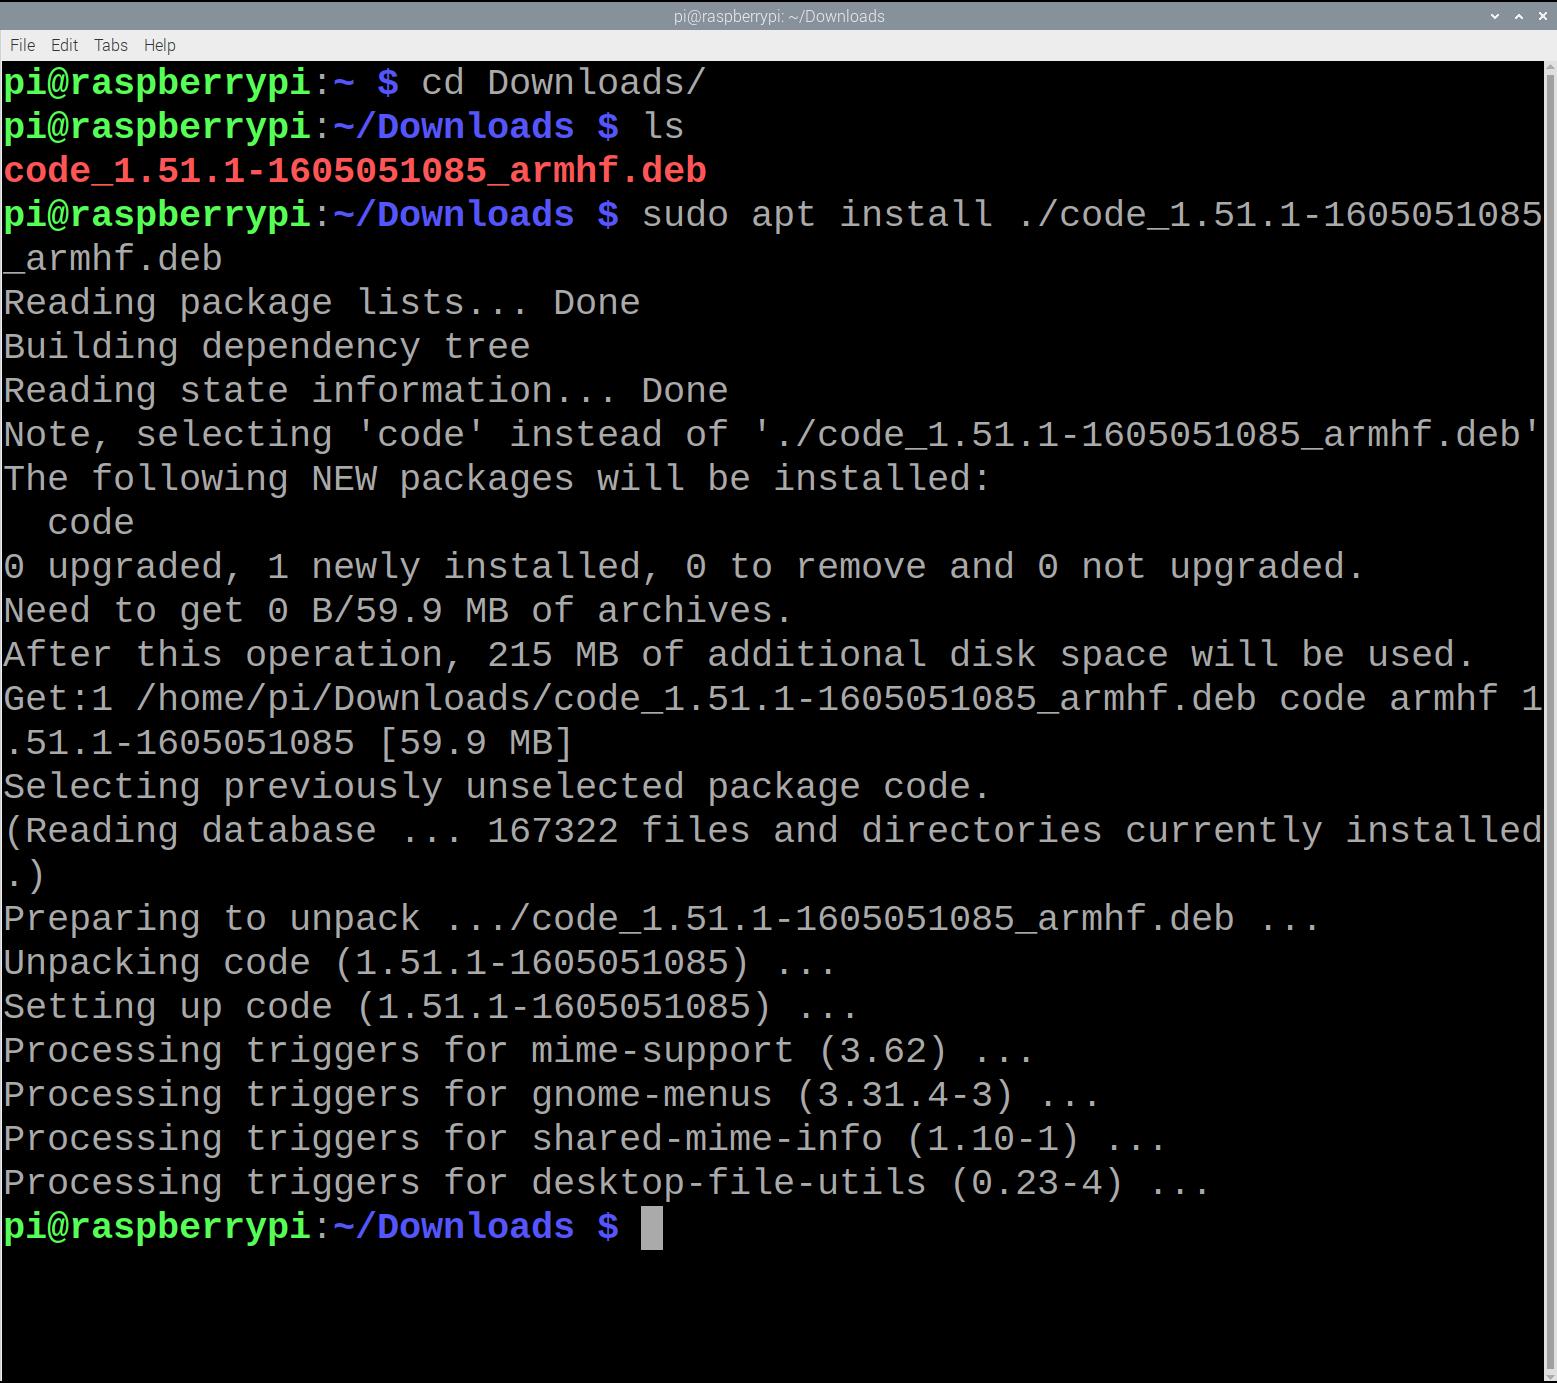 raspberry_pi_Screenshot_from_2020-11-24_13-08-02.png